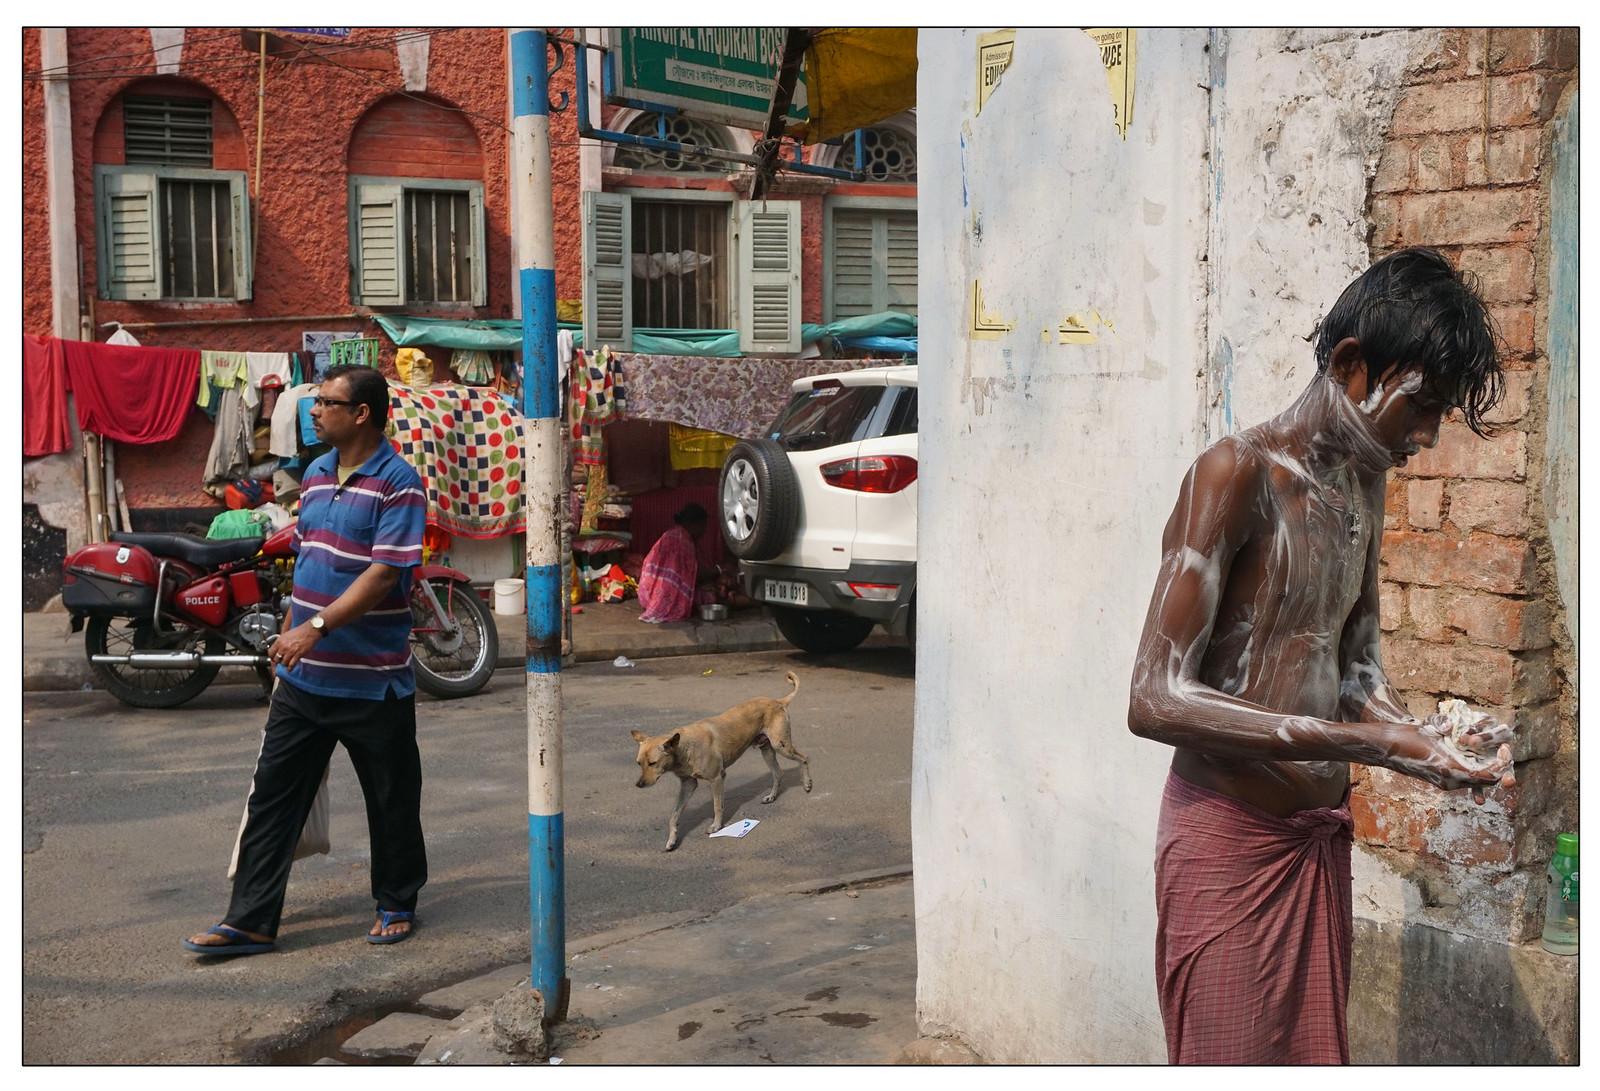 Hatibagan, Kolkata | 2016 | by b i s w a j i t